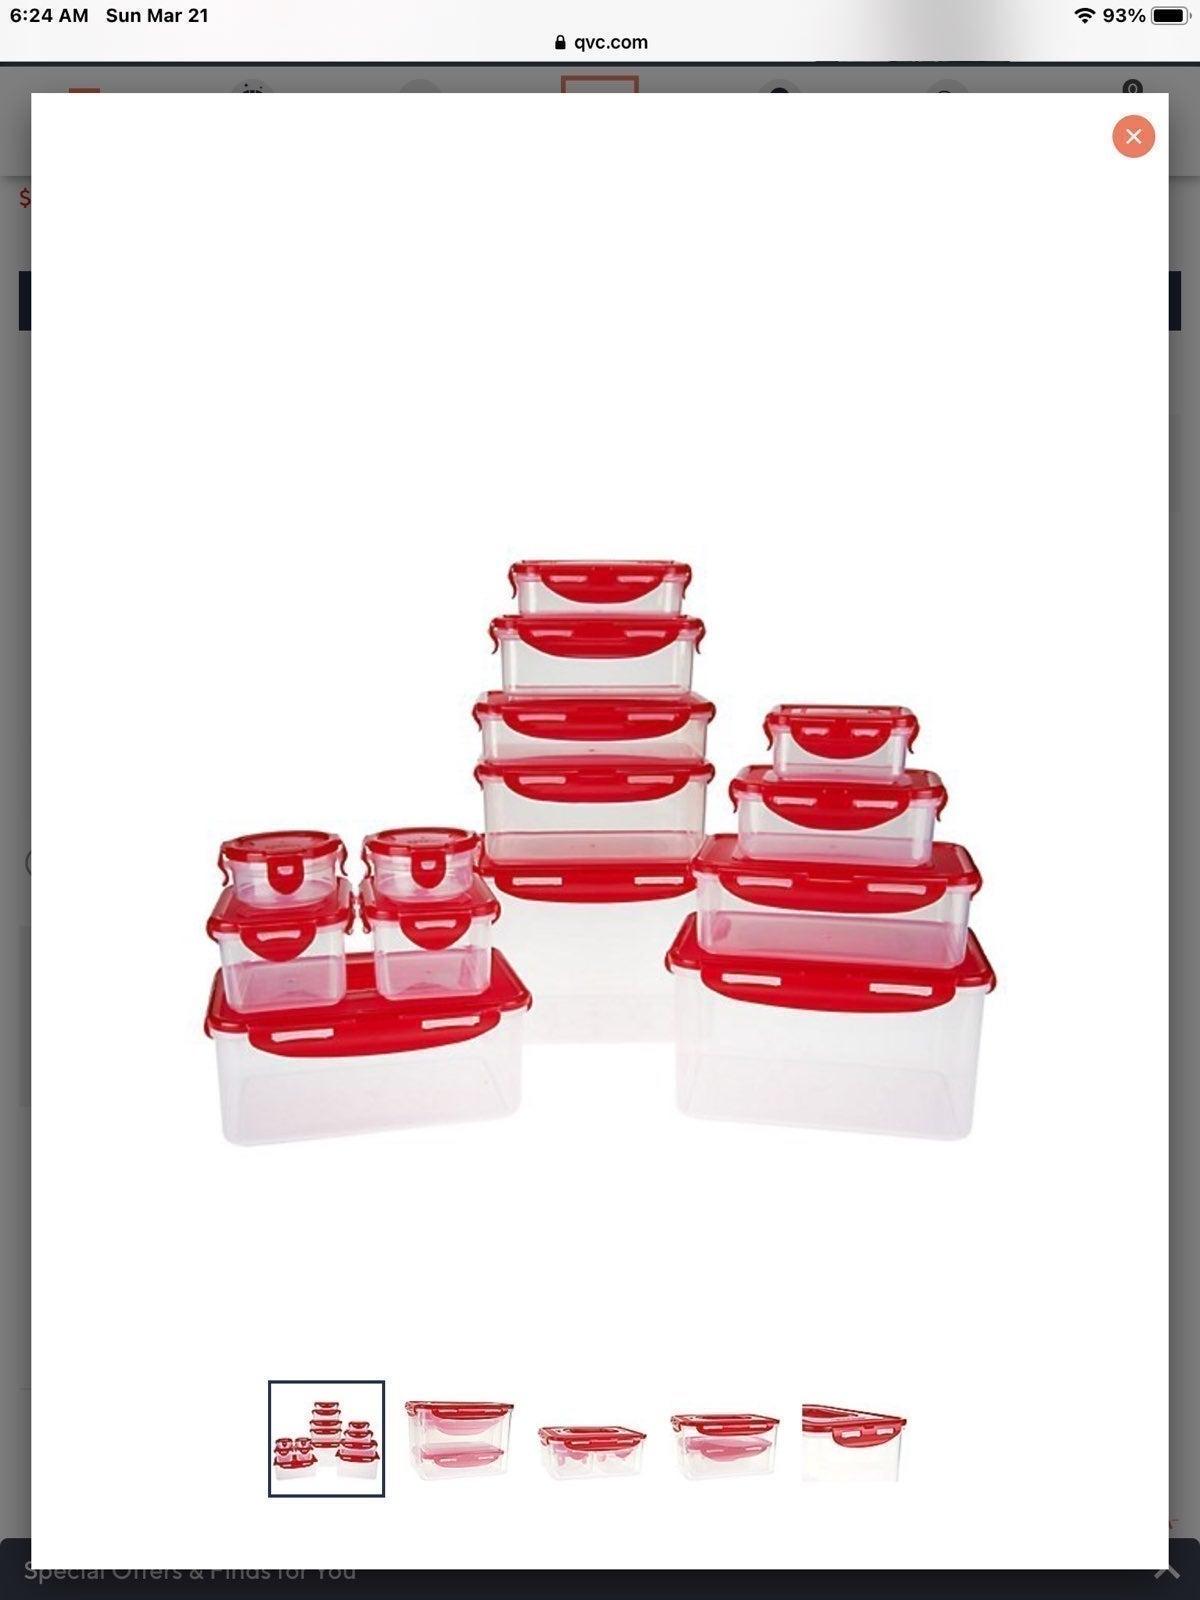 New Red LockNLock 14pc nestable set